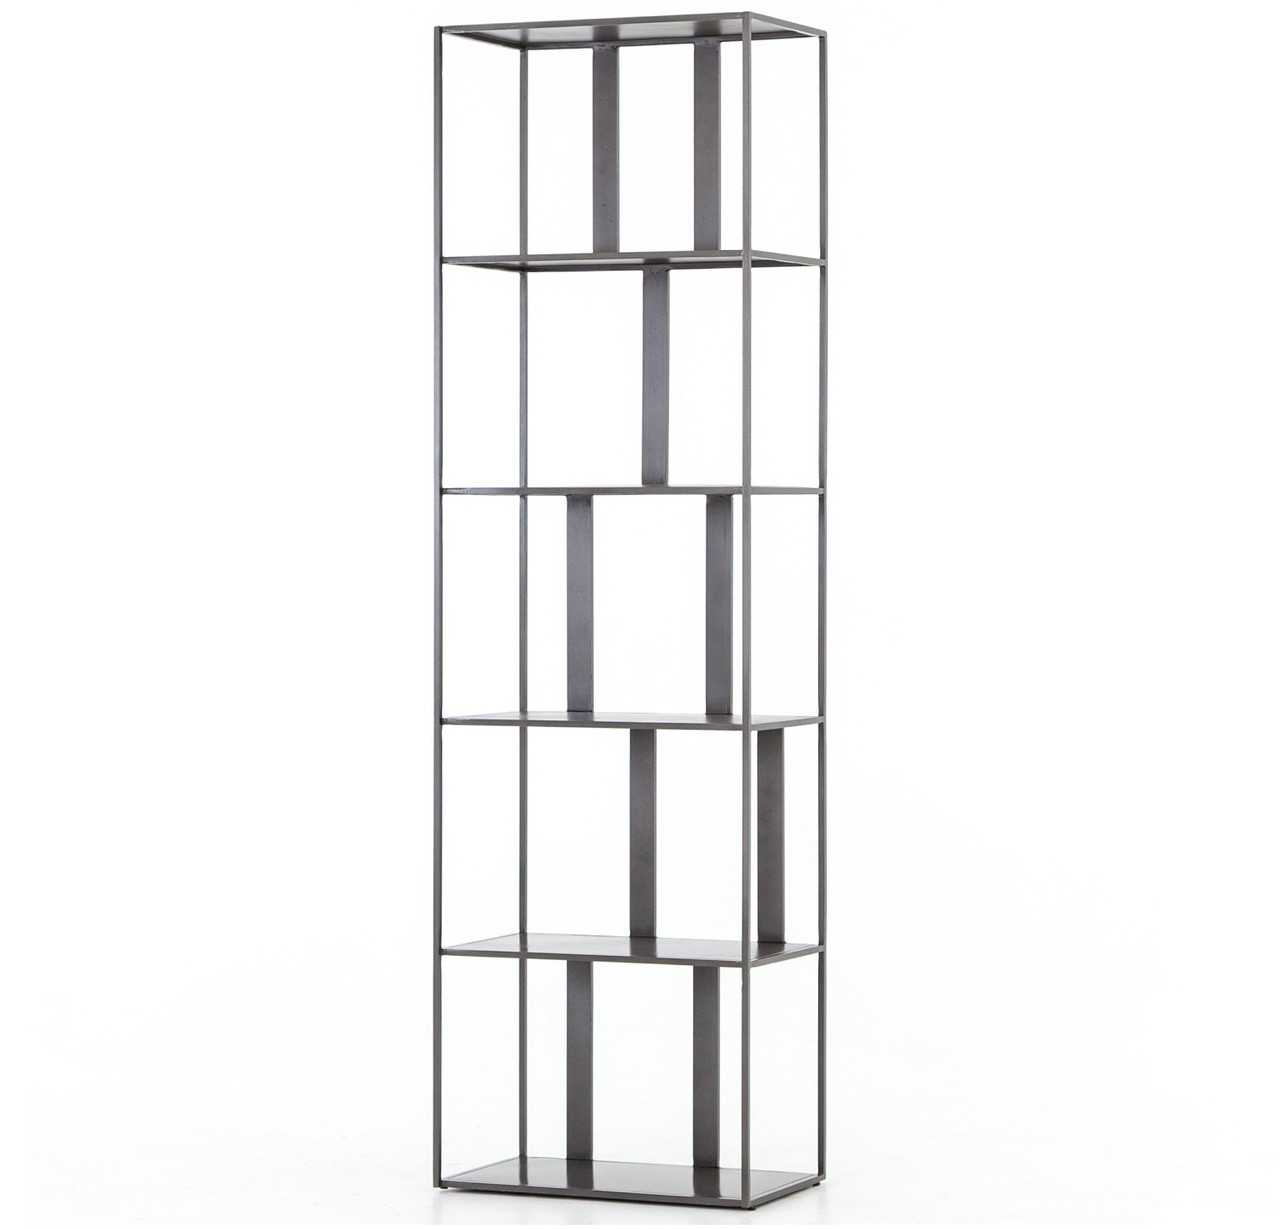 Waterloo Industrial Metal Geometric Narrow Bookshelf